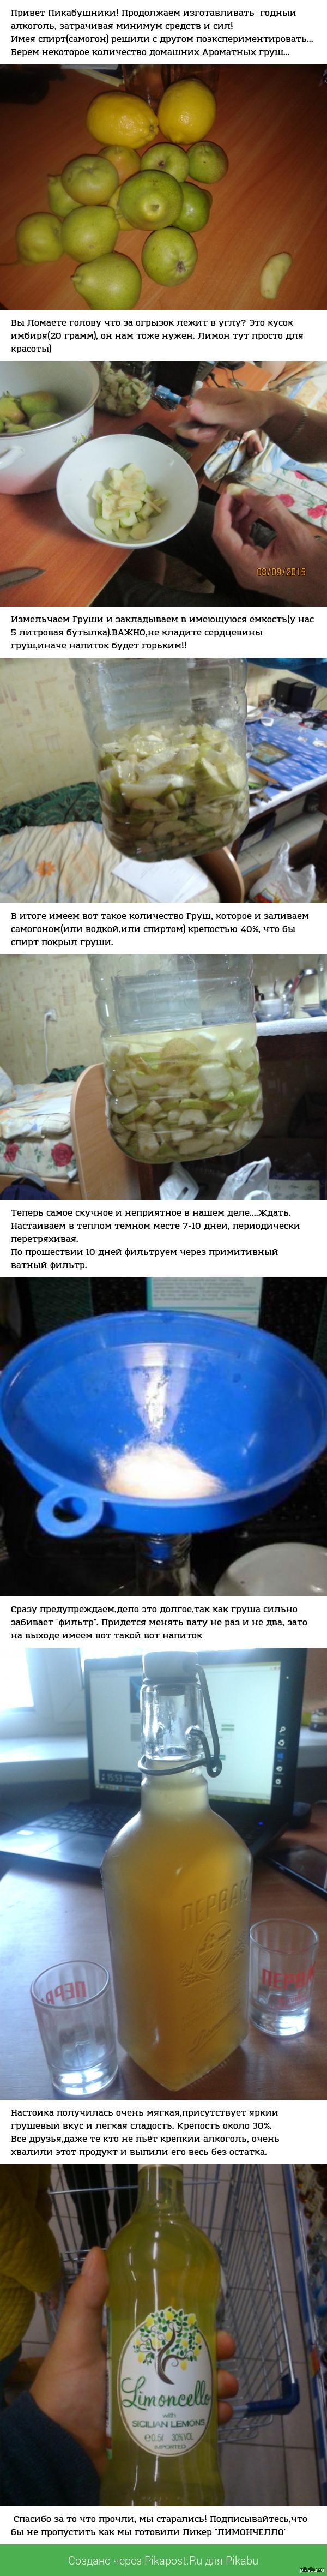 "Готовим ""ГРУШОВКУ"" или другие эксперименты с СЭМом. Этот пост продолжение <a href=""http://pikabu.ru/story/kak_myi_samogon_delali_chast_1_3652243"">http://pikabu.ru/story/_3652243</a>"